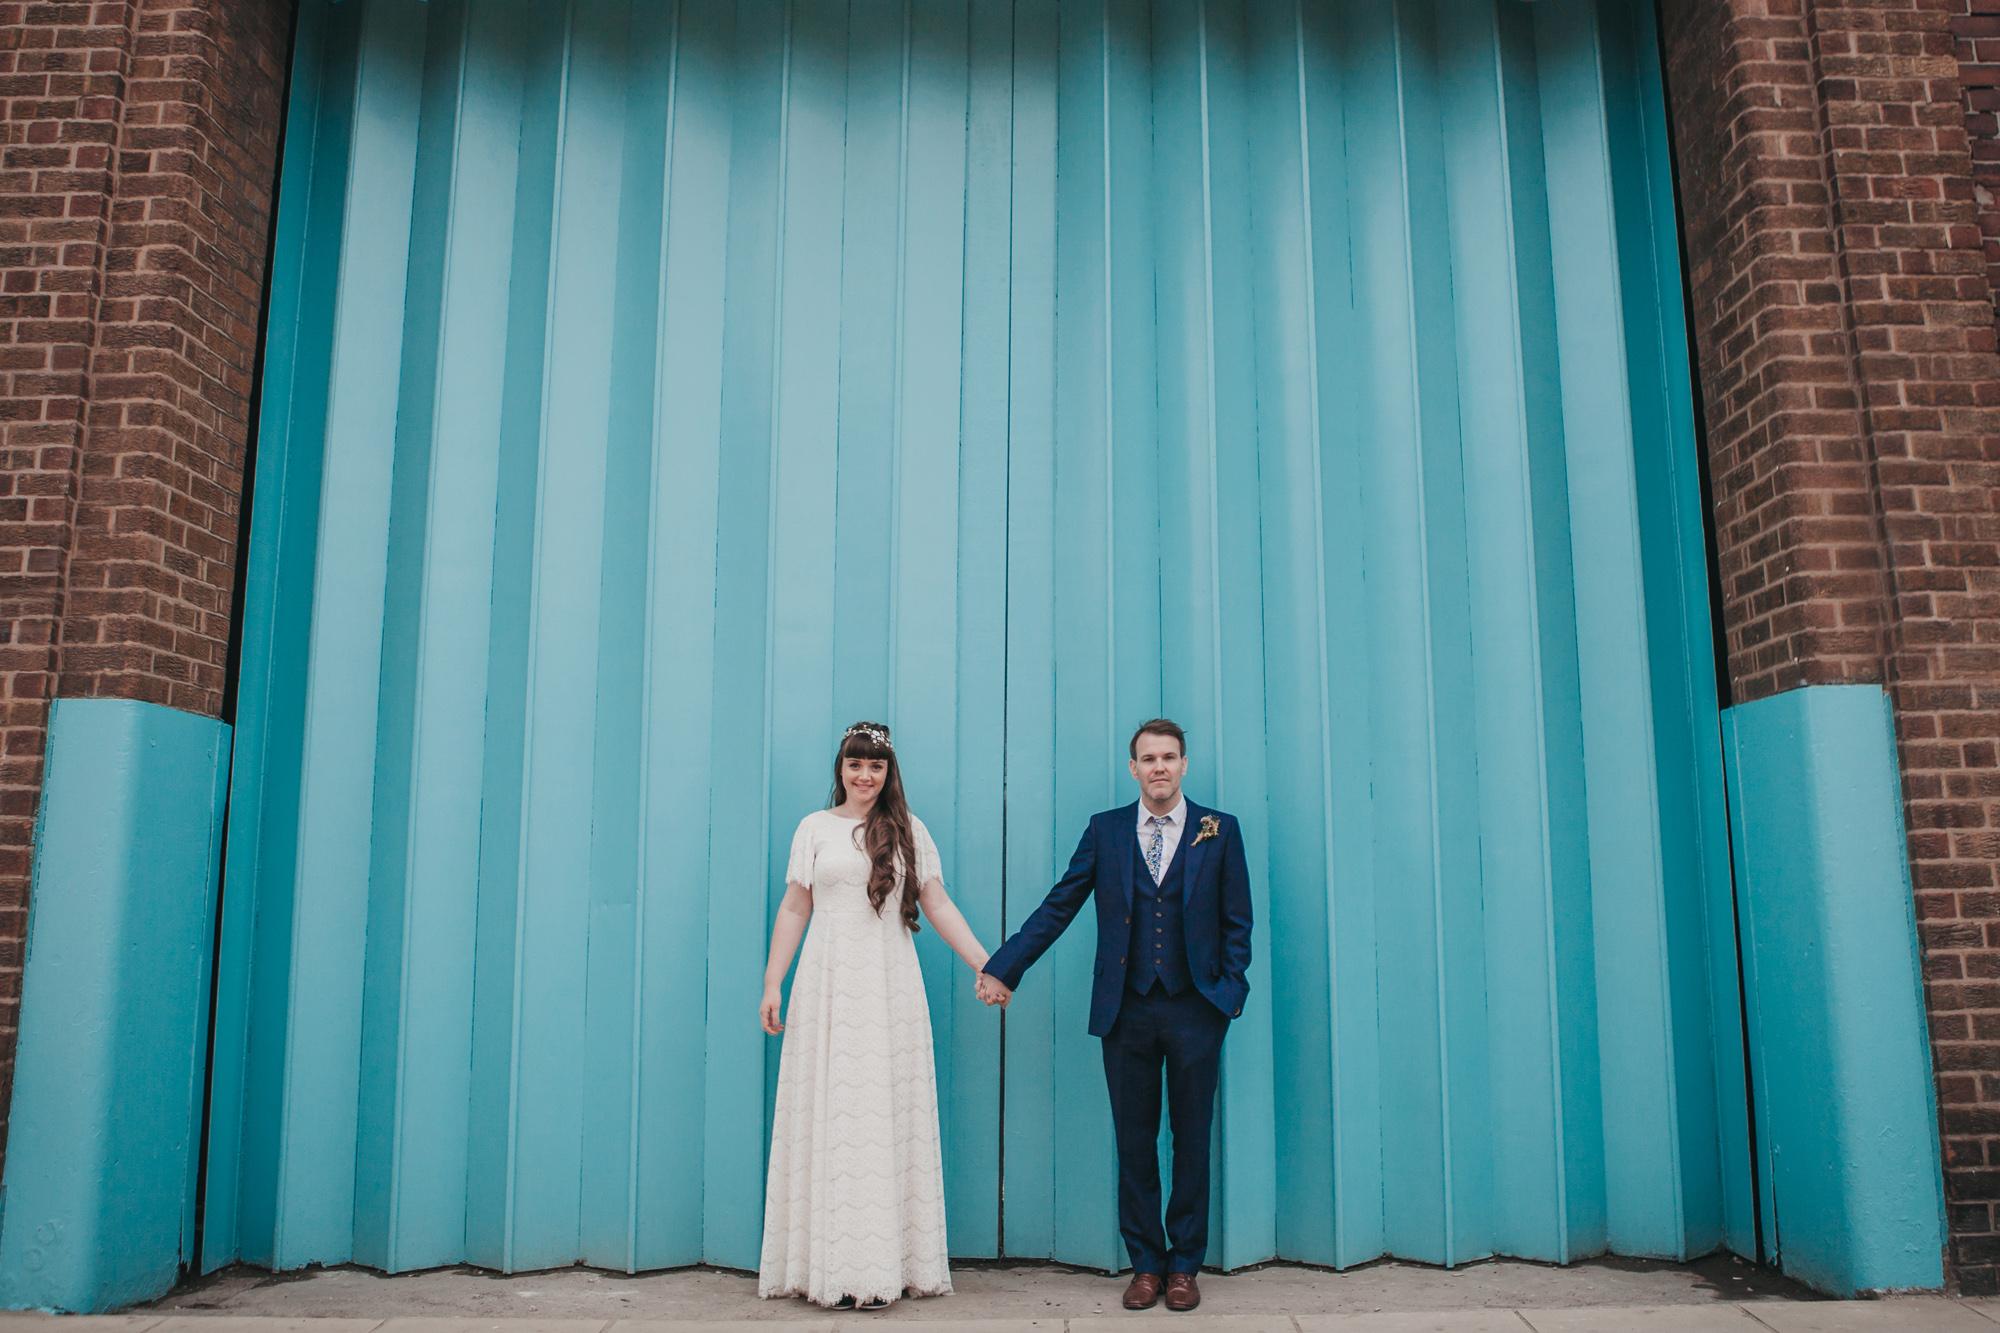 Kristy-Back-Garden-Outdoor-Wedding-Sheffield-Industrial-Warehouse-Wedding-Bohemian-Kate-Beaumont-Dahlia-Dress-44.jpg